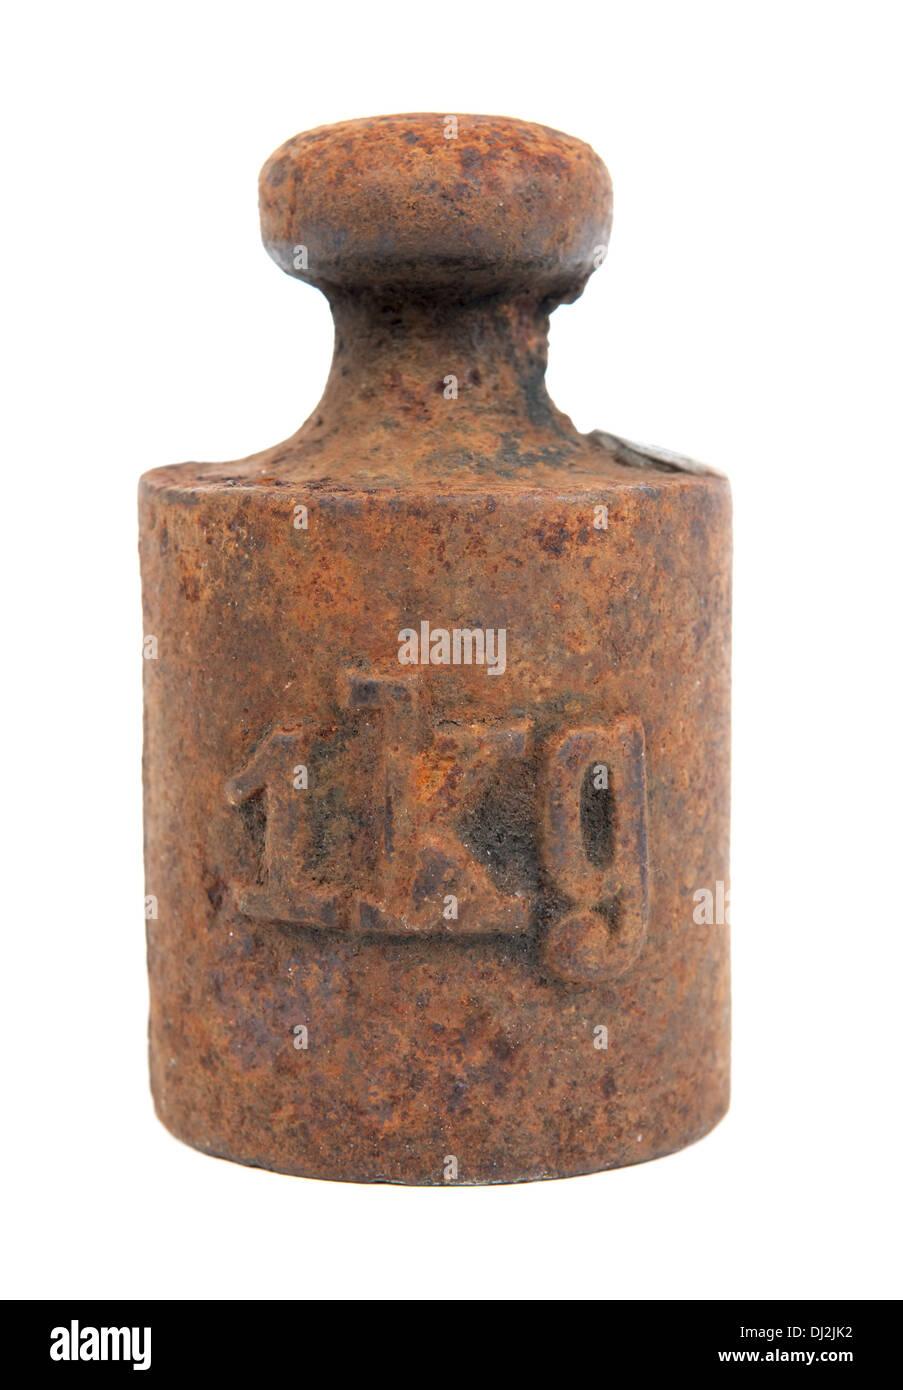 one kilogram weight - Stock Image